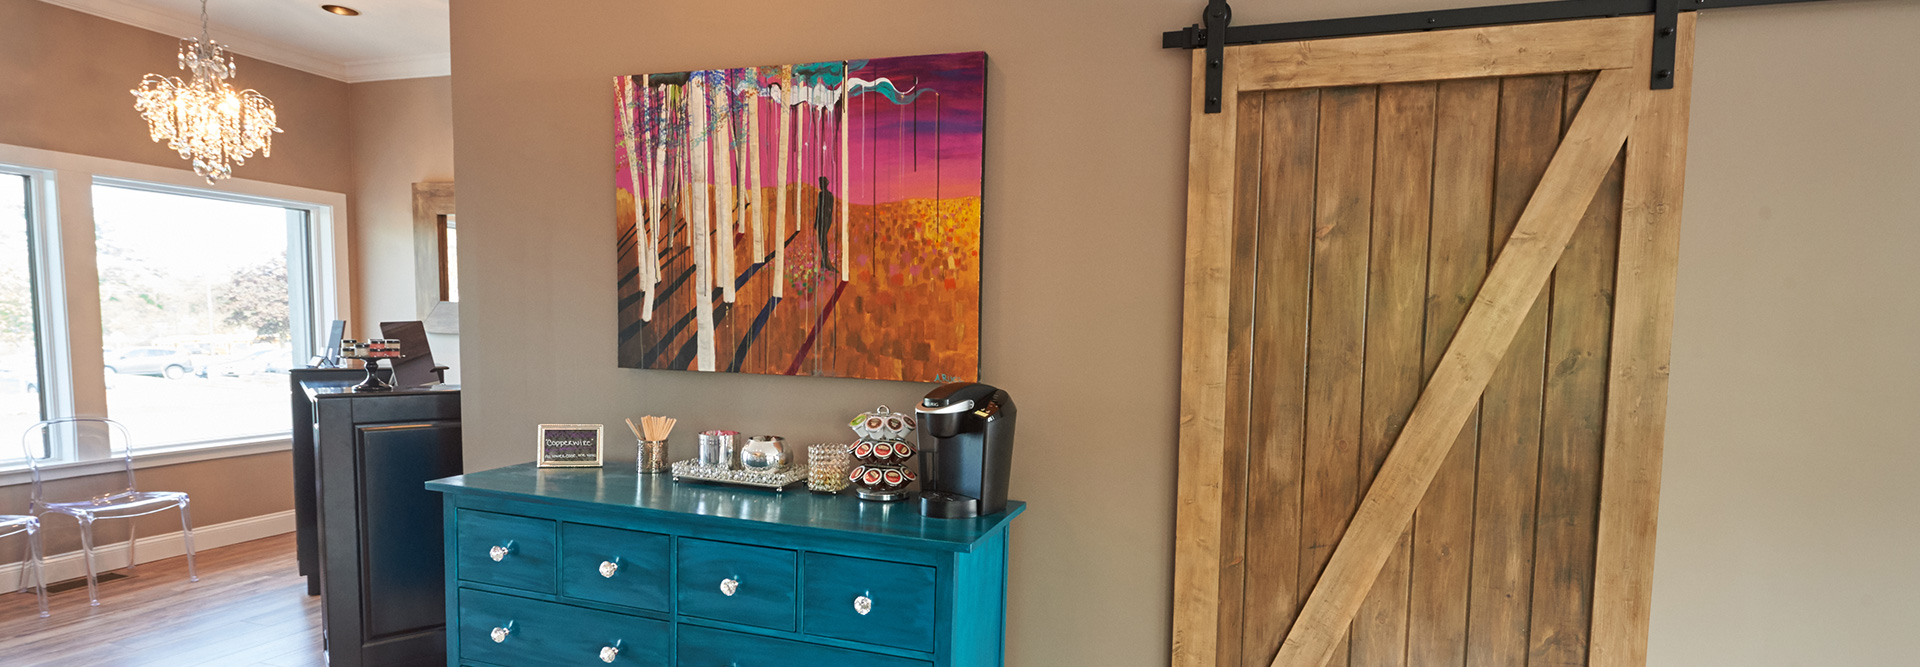 salon22 interior furniture